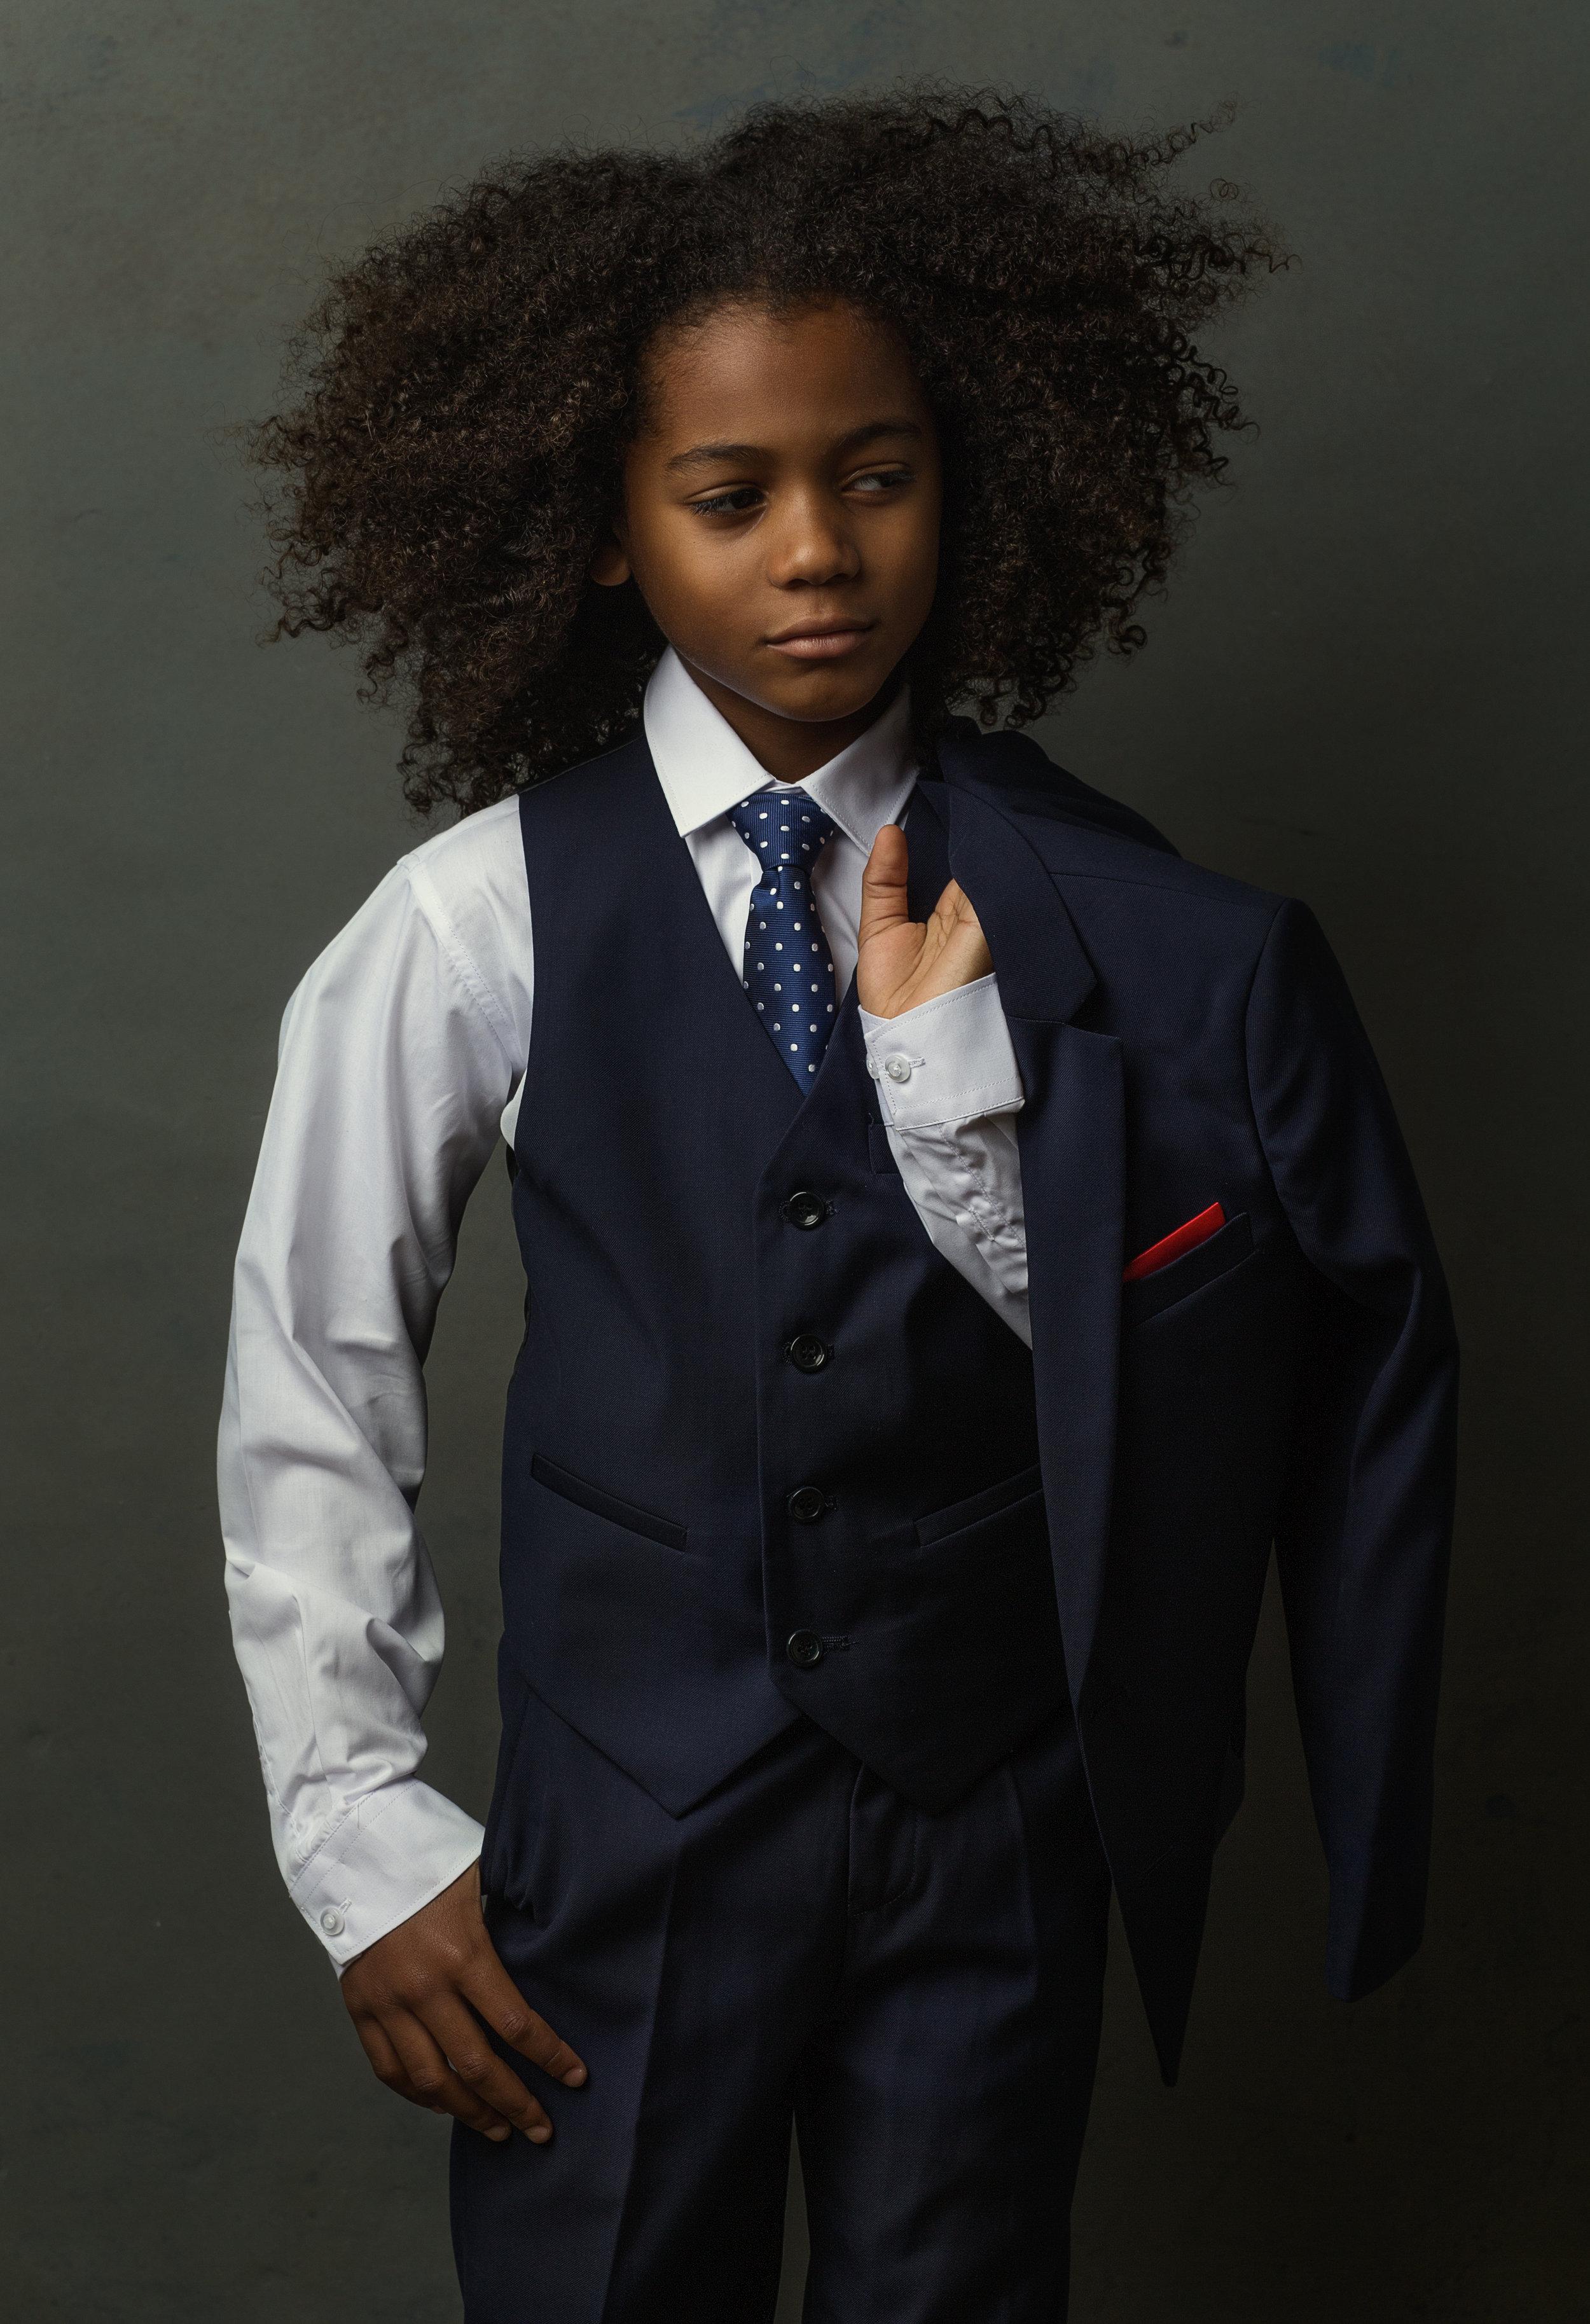 Atlanta-Georgia-Kids Portraits-Ria Rouse Photography Jeremiah-4.jpg